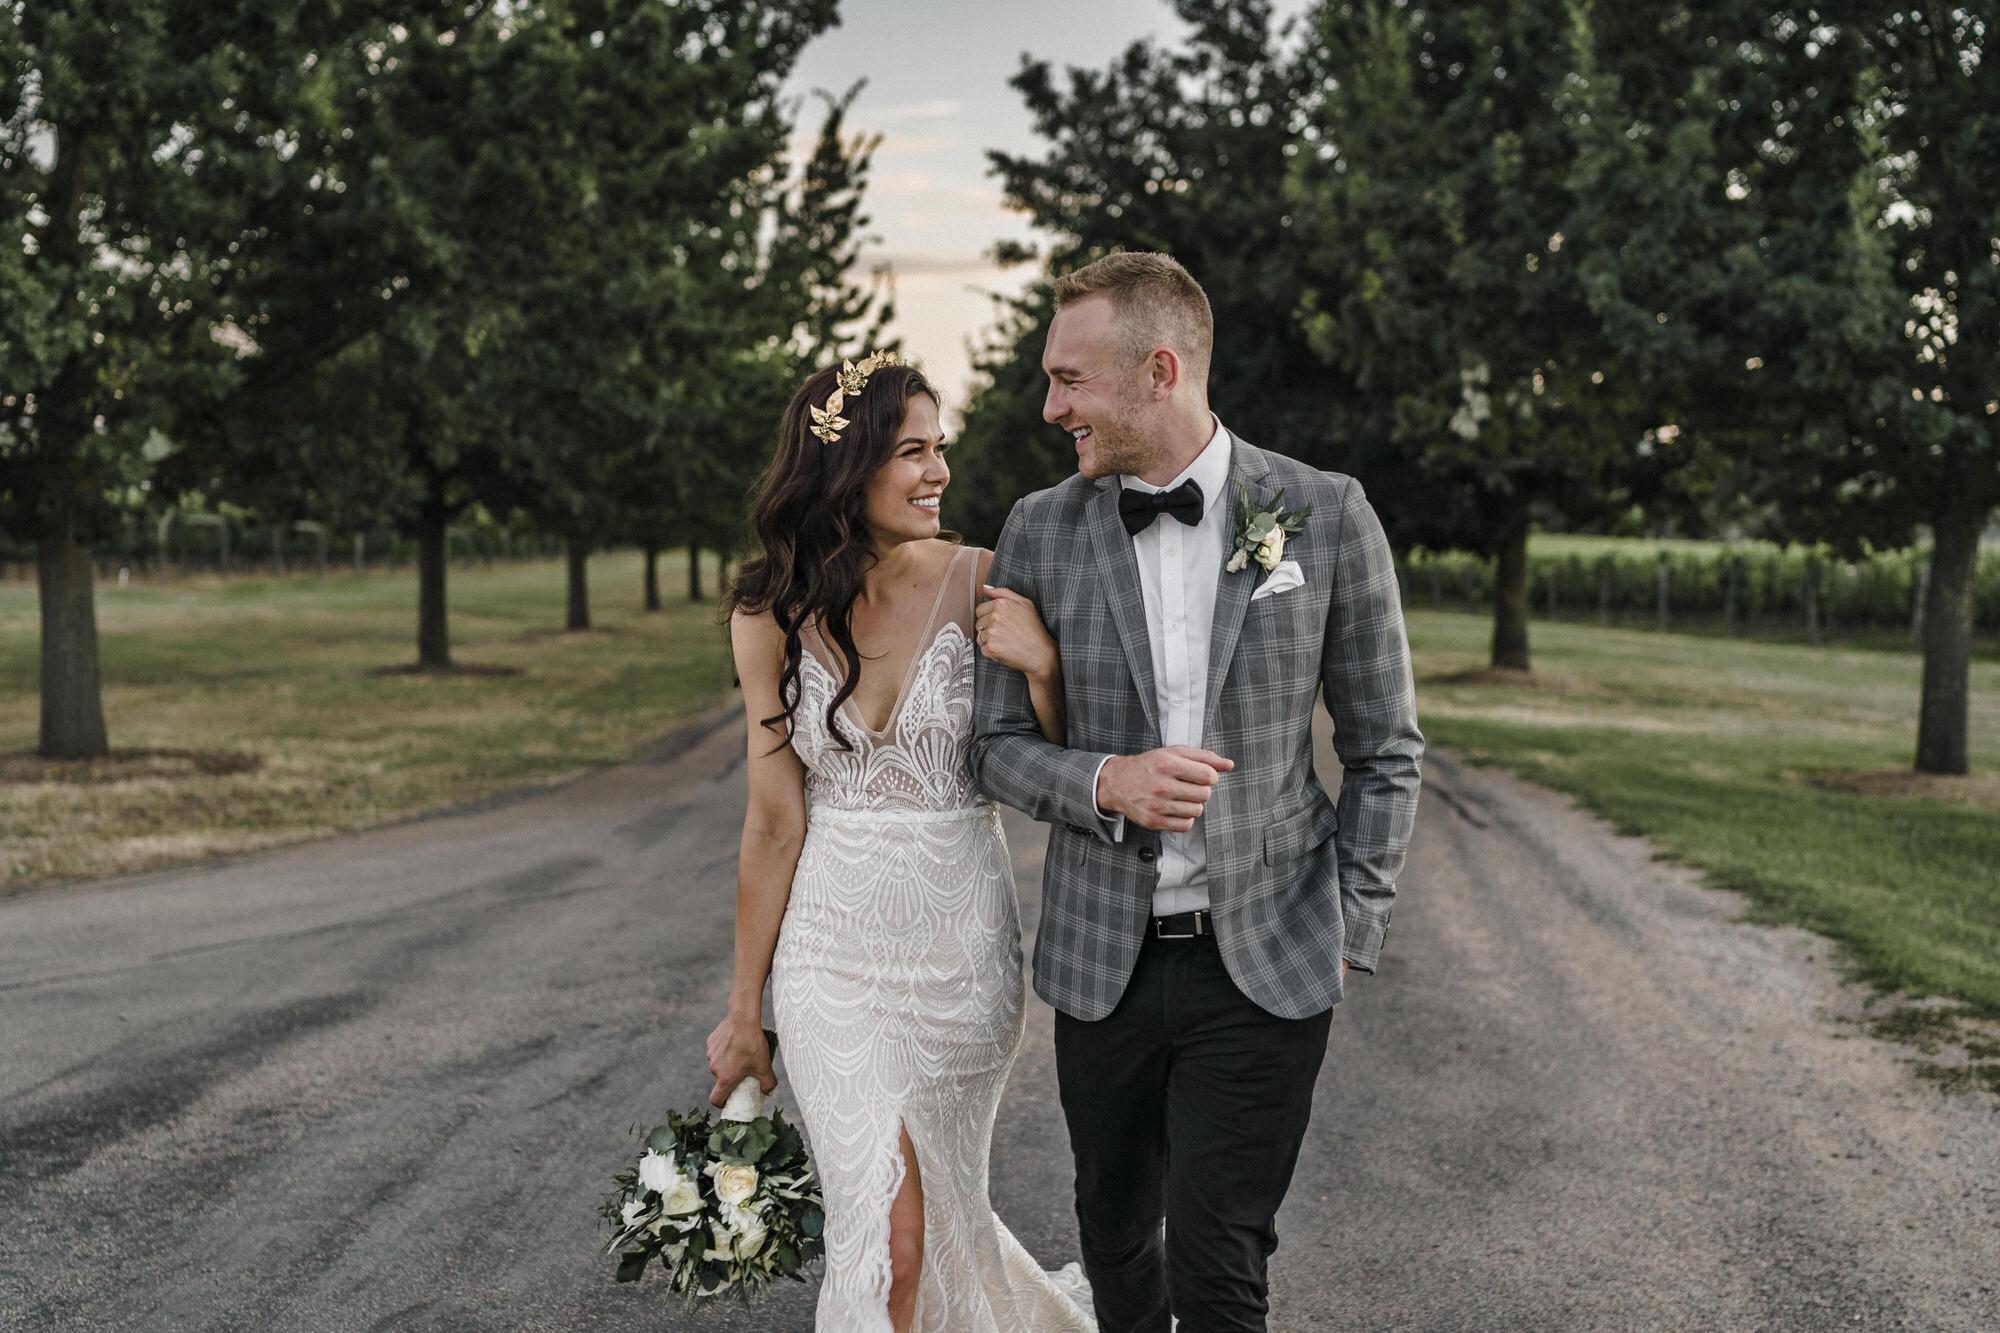 Corey Wright Stones Yarra Valley Wedding Photography_027.jpg